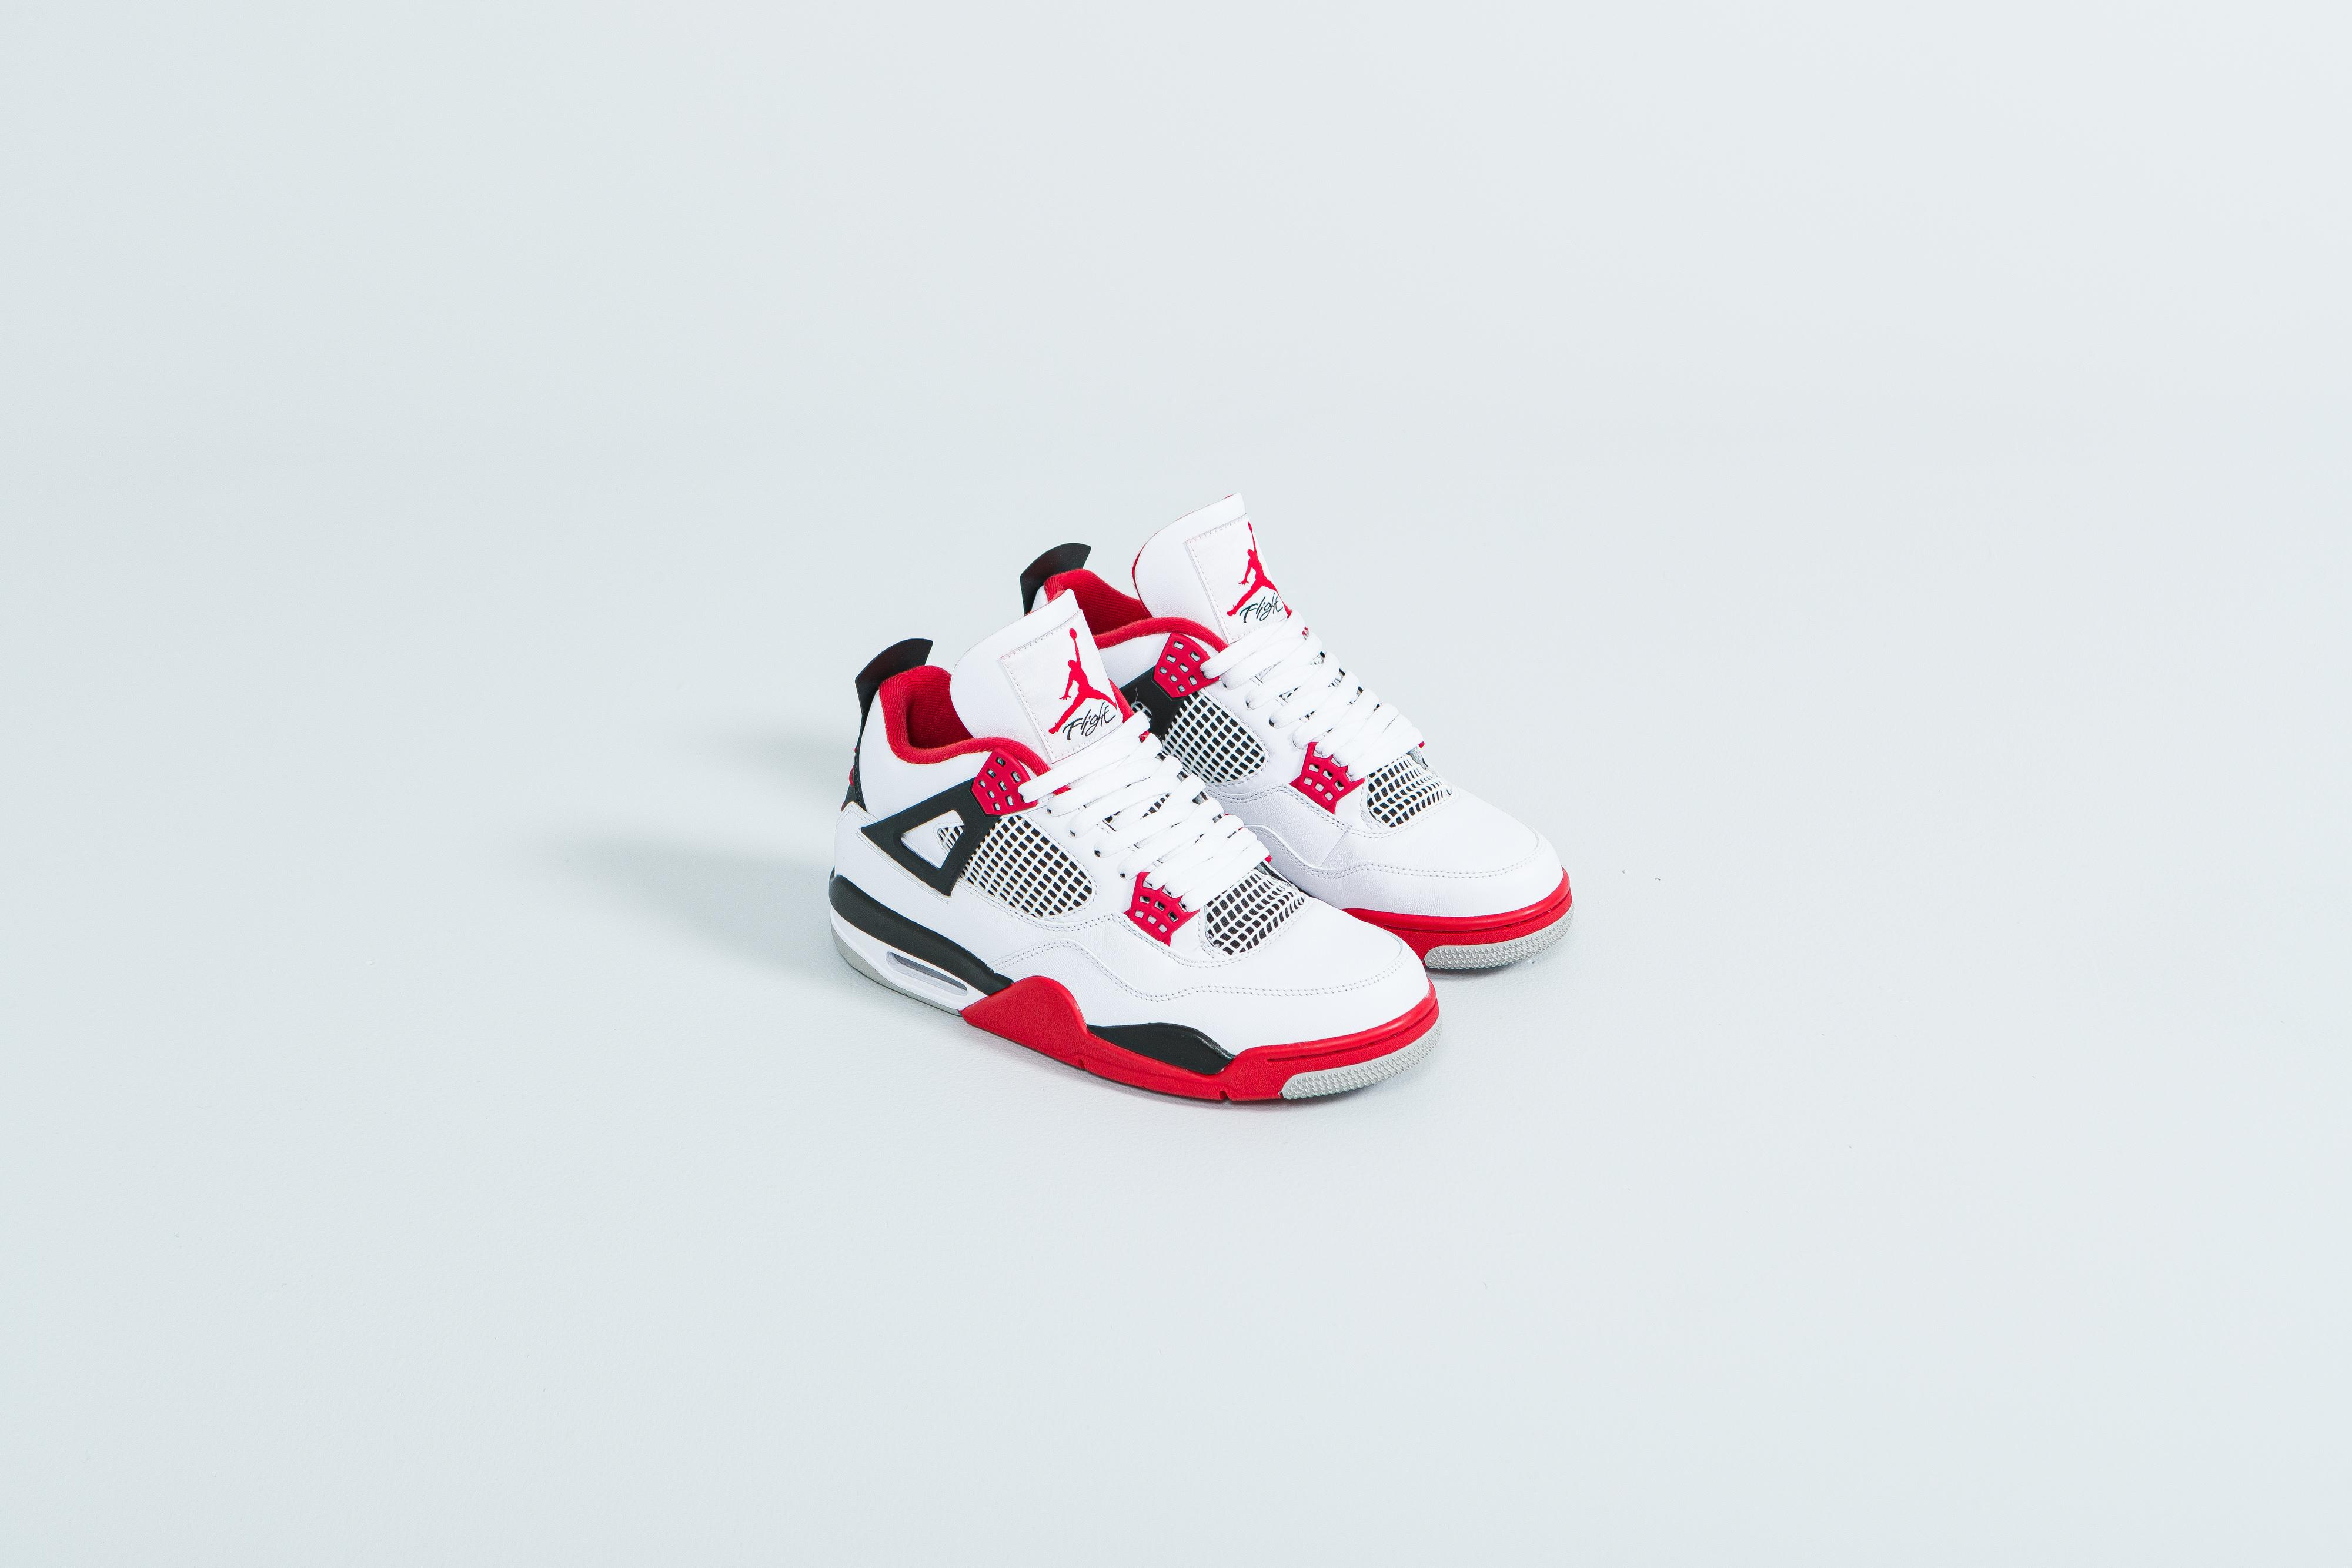 Jordan - Air Jordan 4 Retro GS - White/Fire Red-Black-Tech Grey - Up There